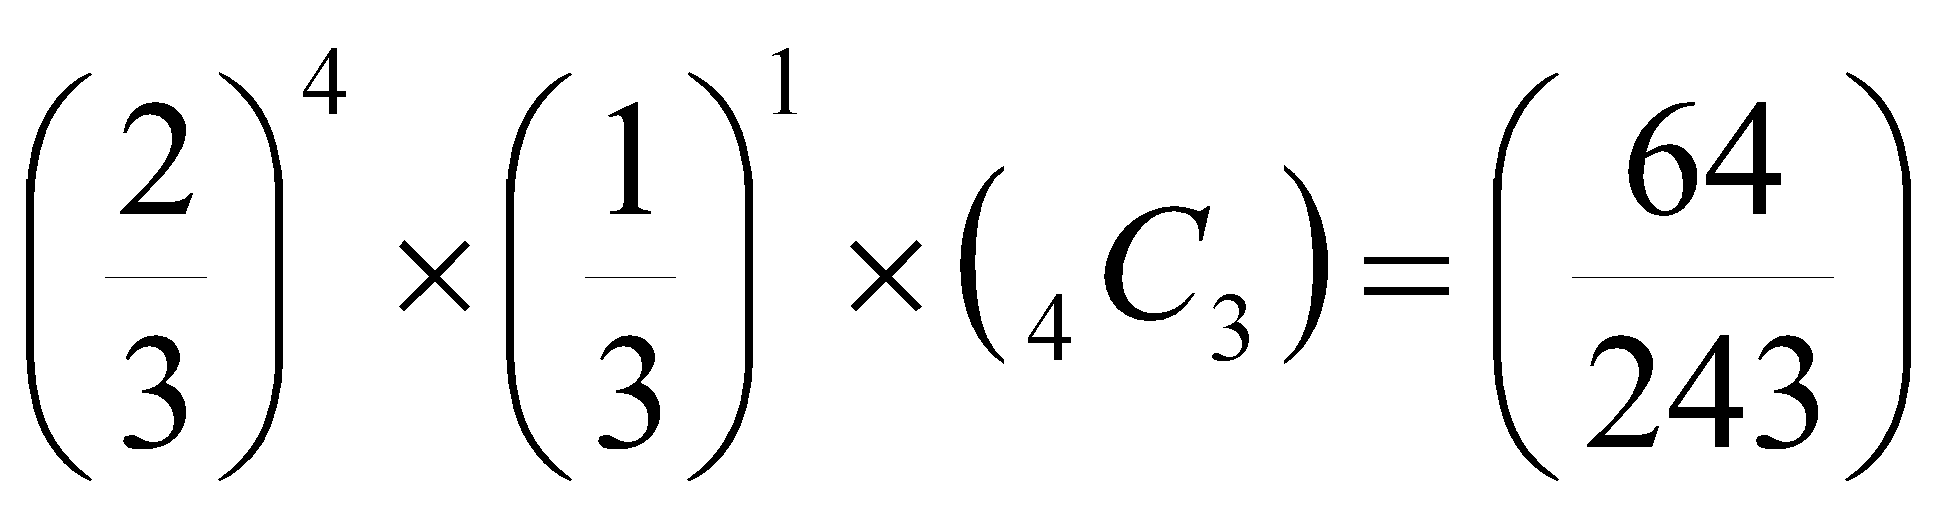 image39.png